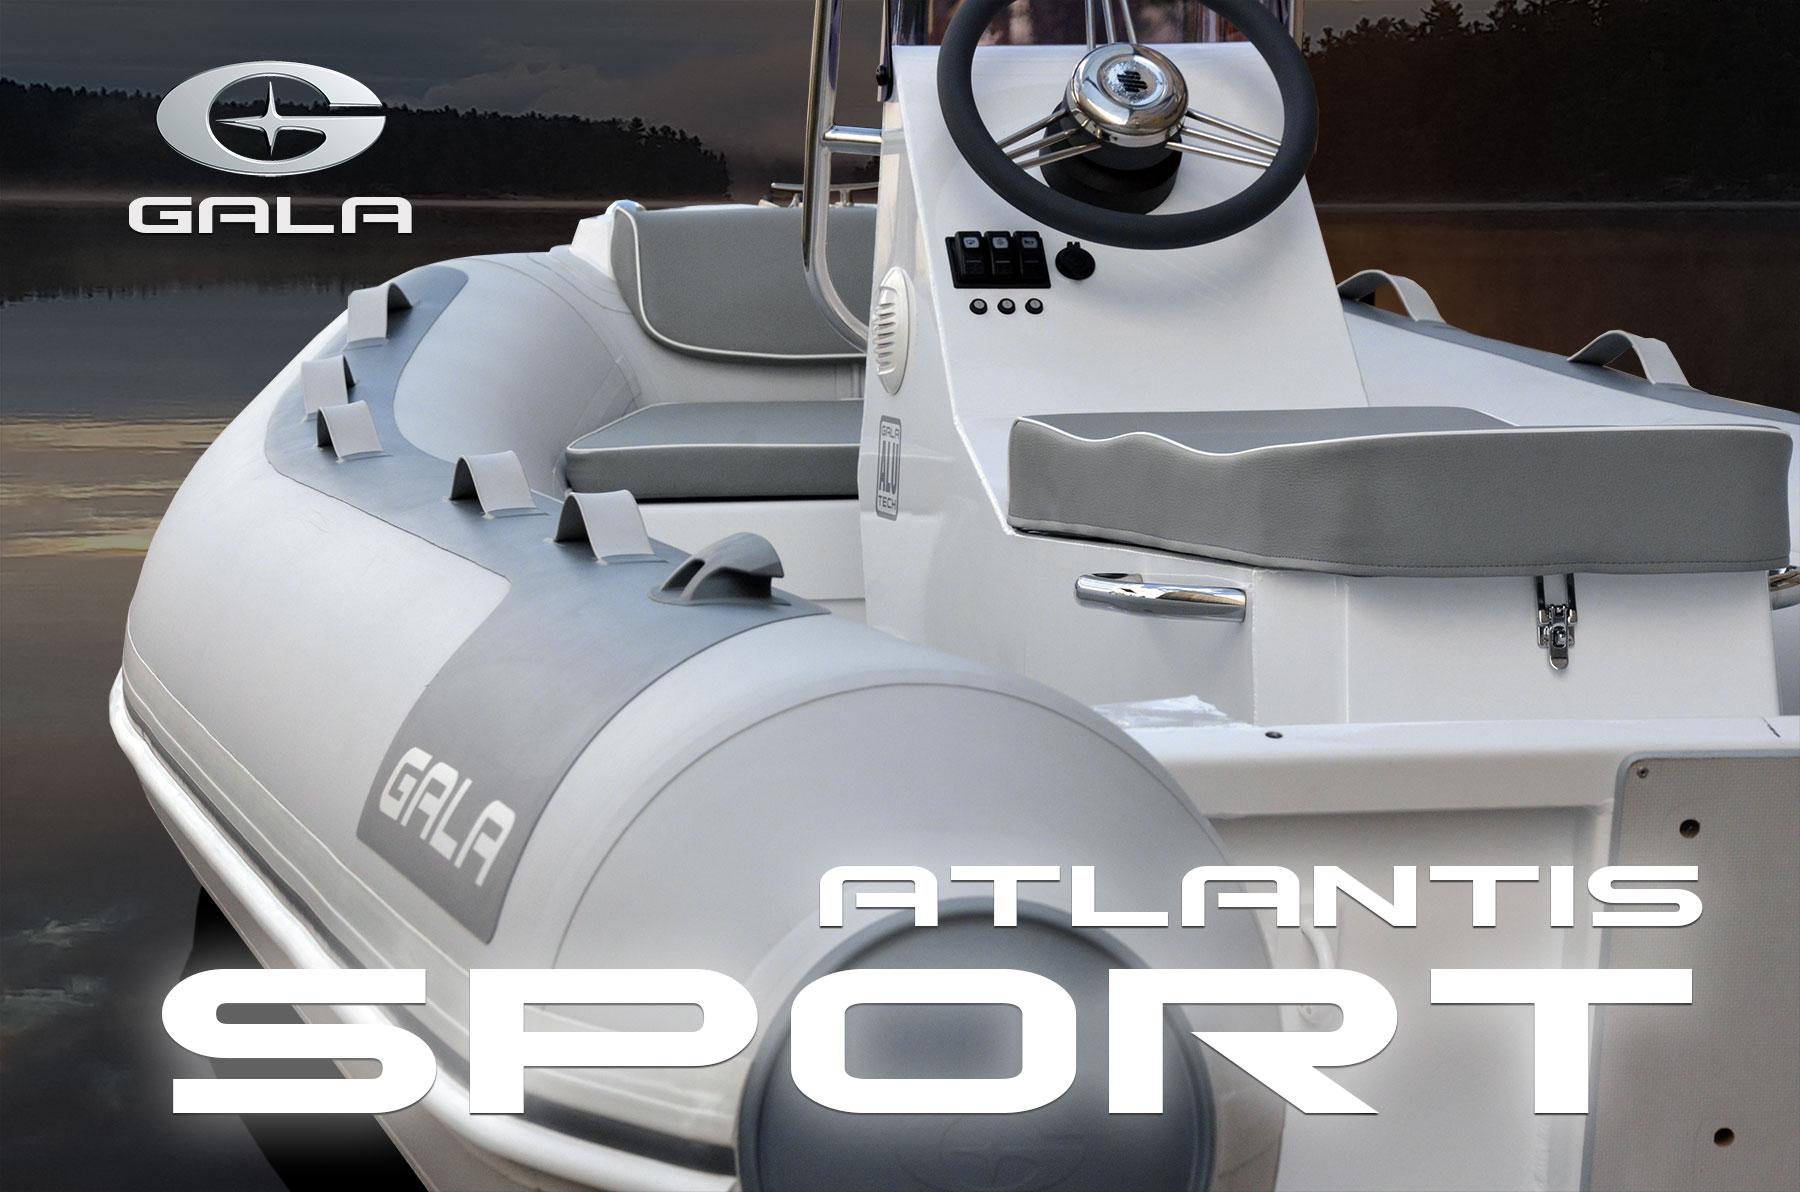 Gala RIB ATLANTIS SPORT felfújható hajó